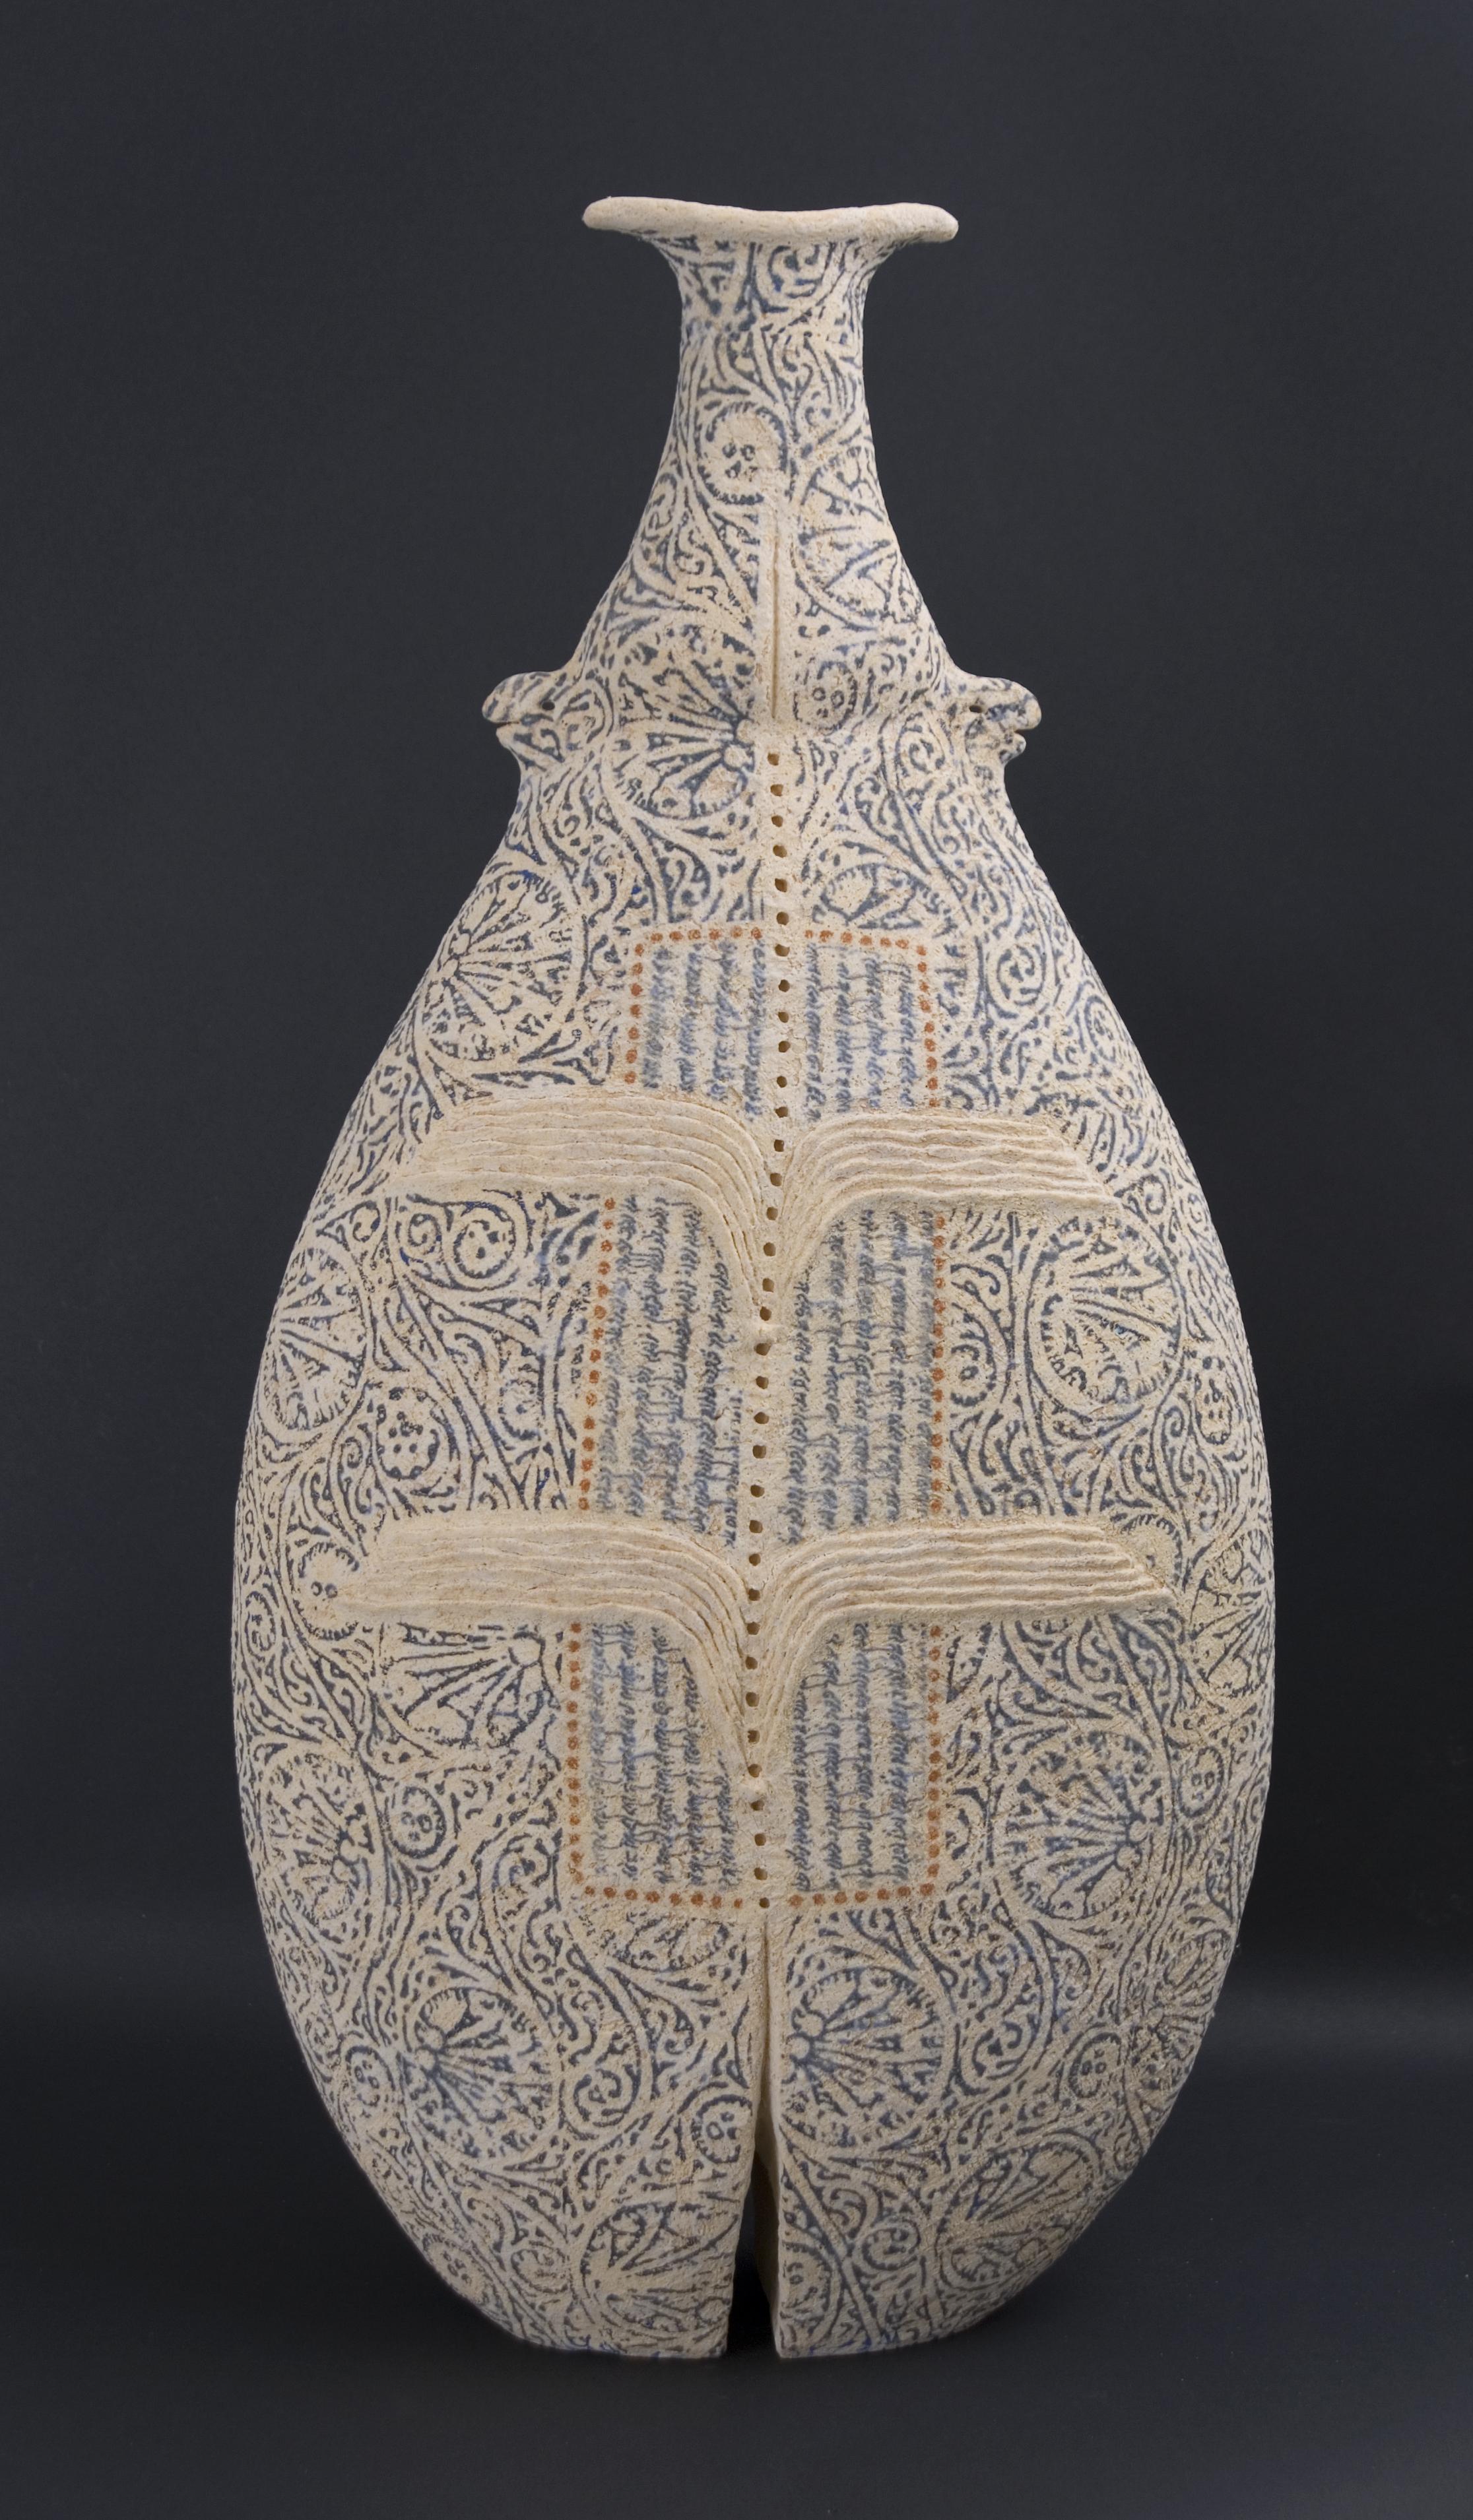 Avital Sheffer    Inannah V  , 2009 Handbuilt earthenware 26.77 x 12.99 x 7.09 inches / 68 x 33 x 18 cm / ASh 2